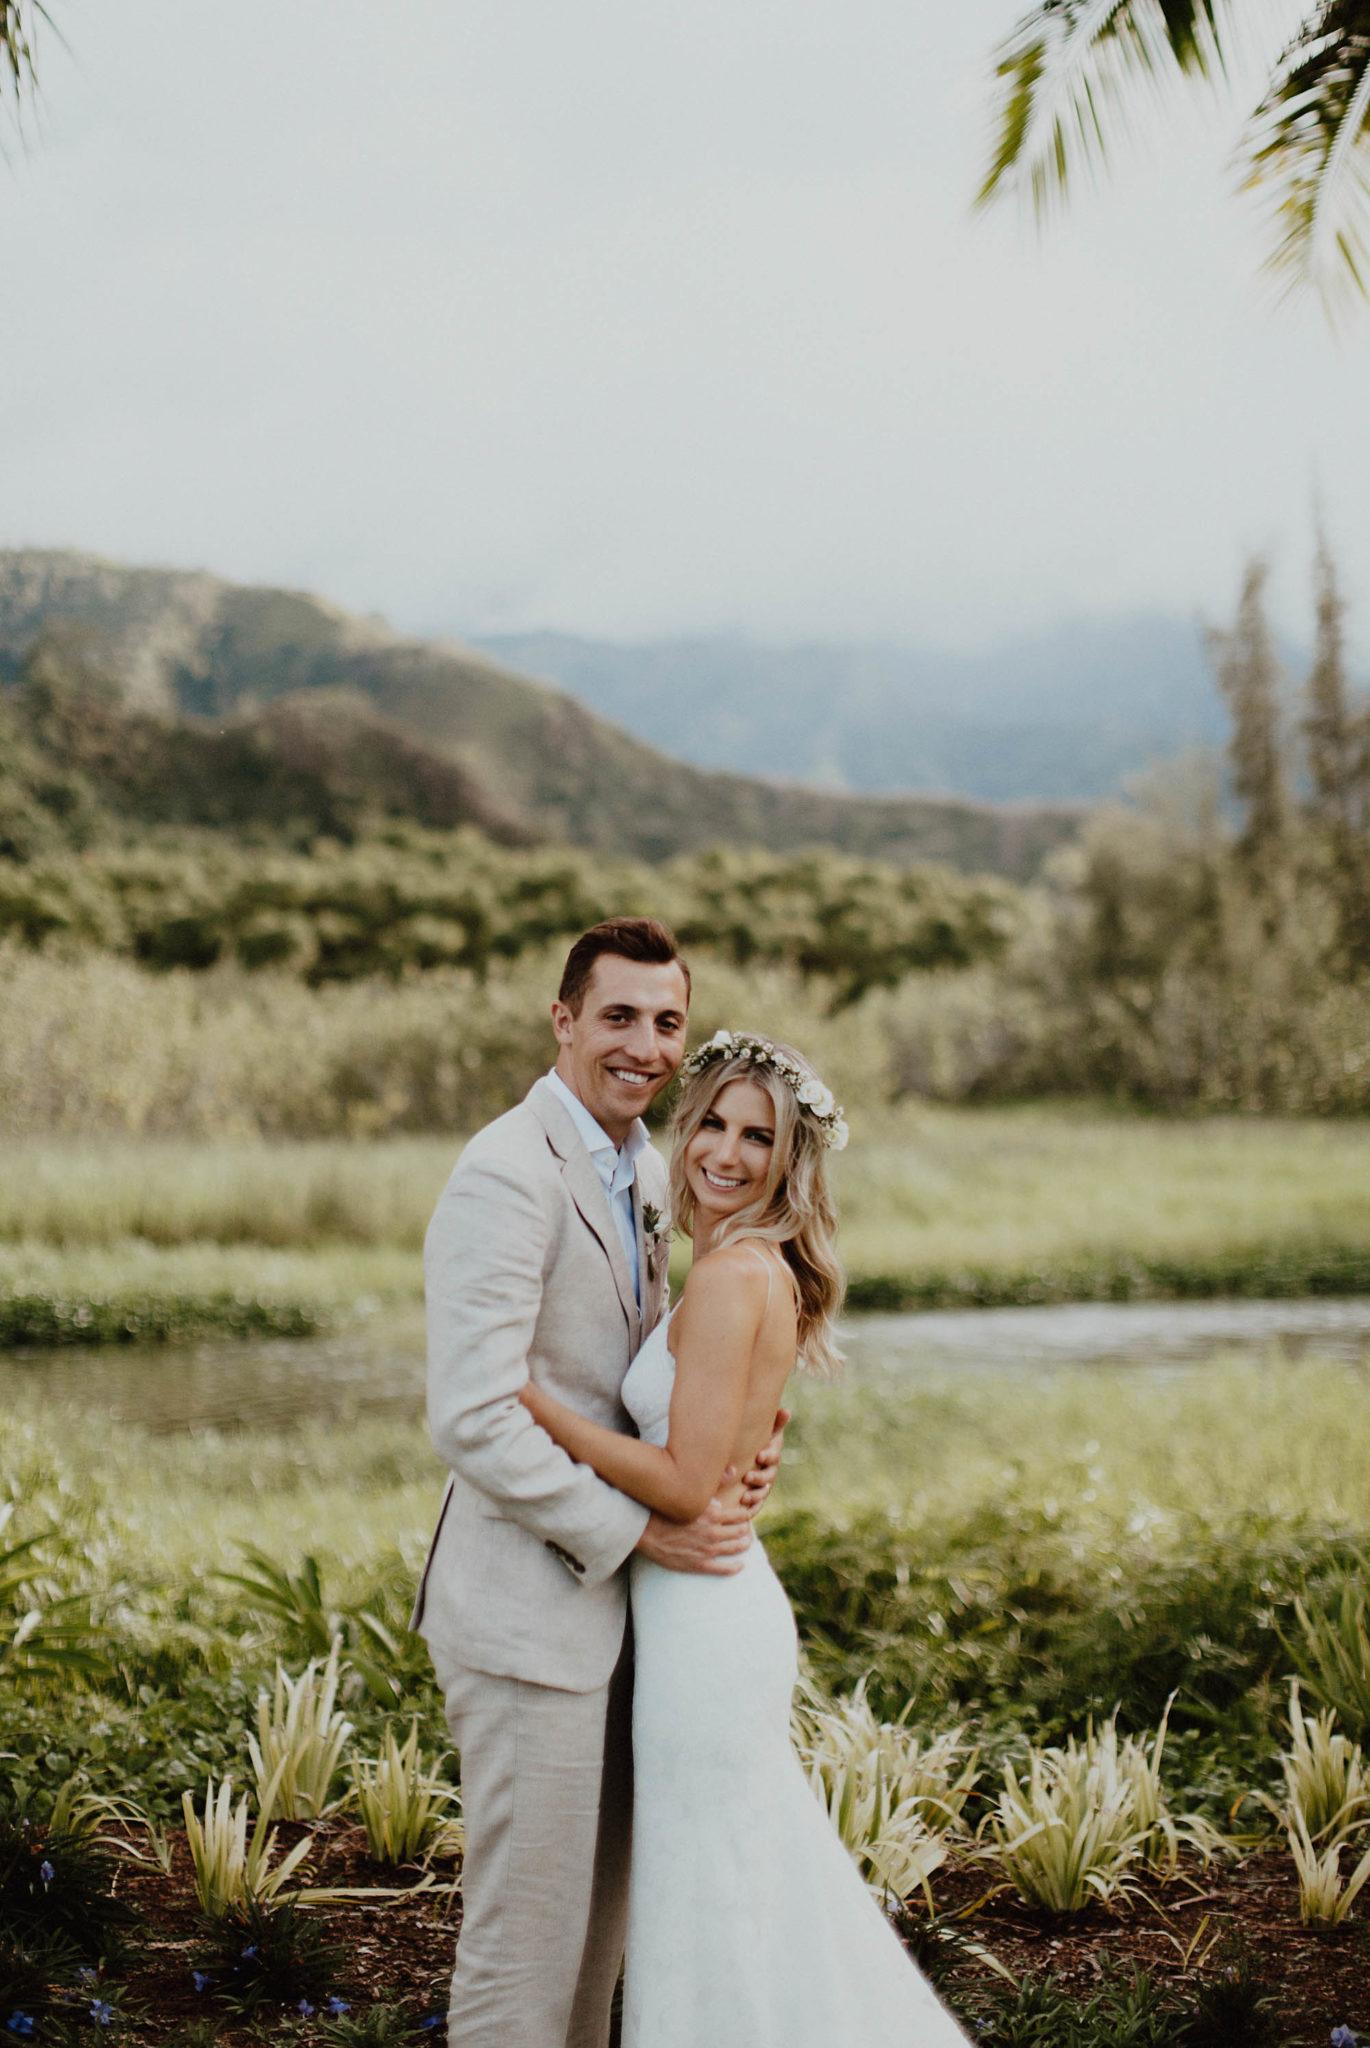 Wedding photos in paradise backless lace dress hanalei north shore kauai hawaii